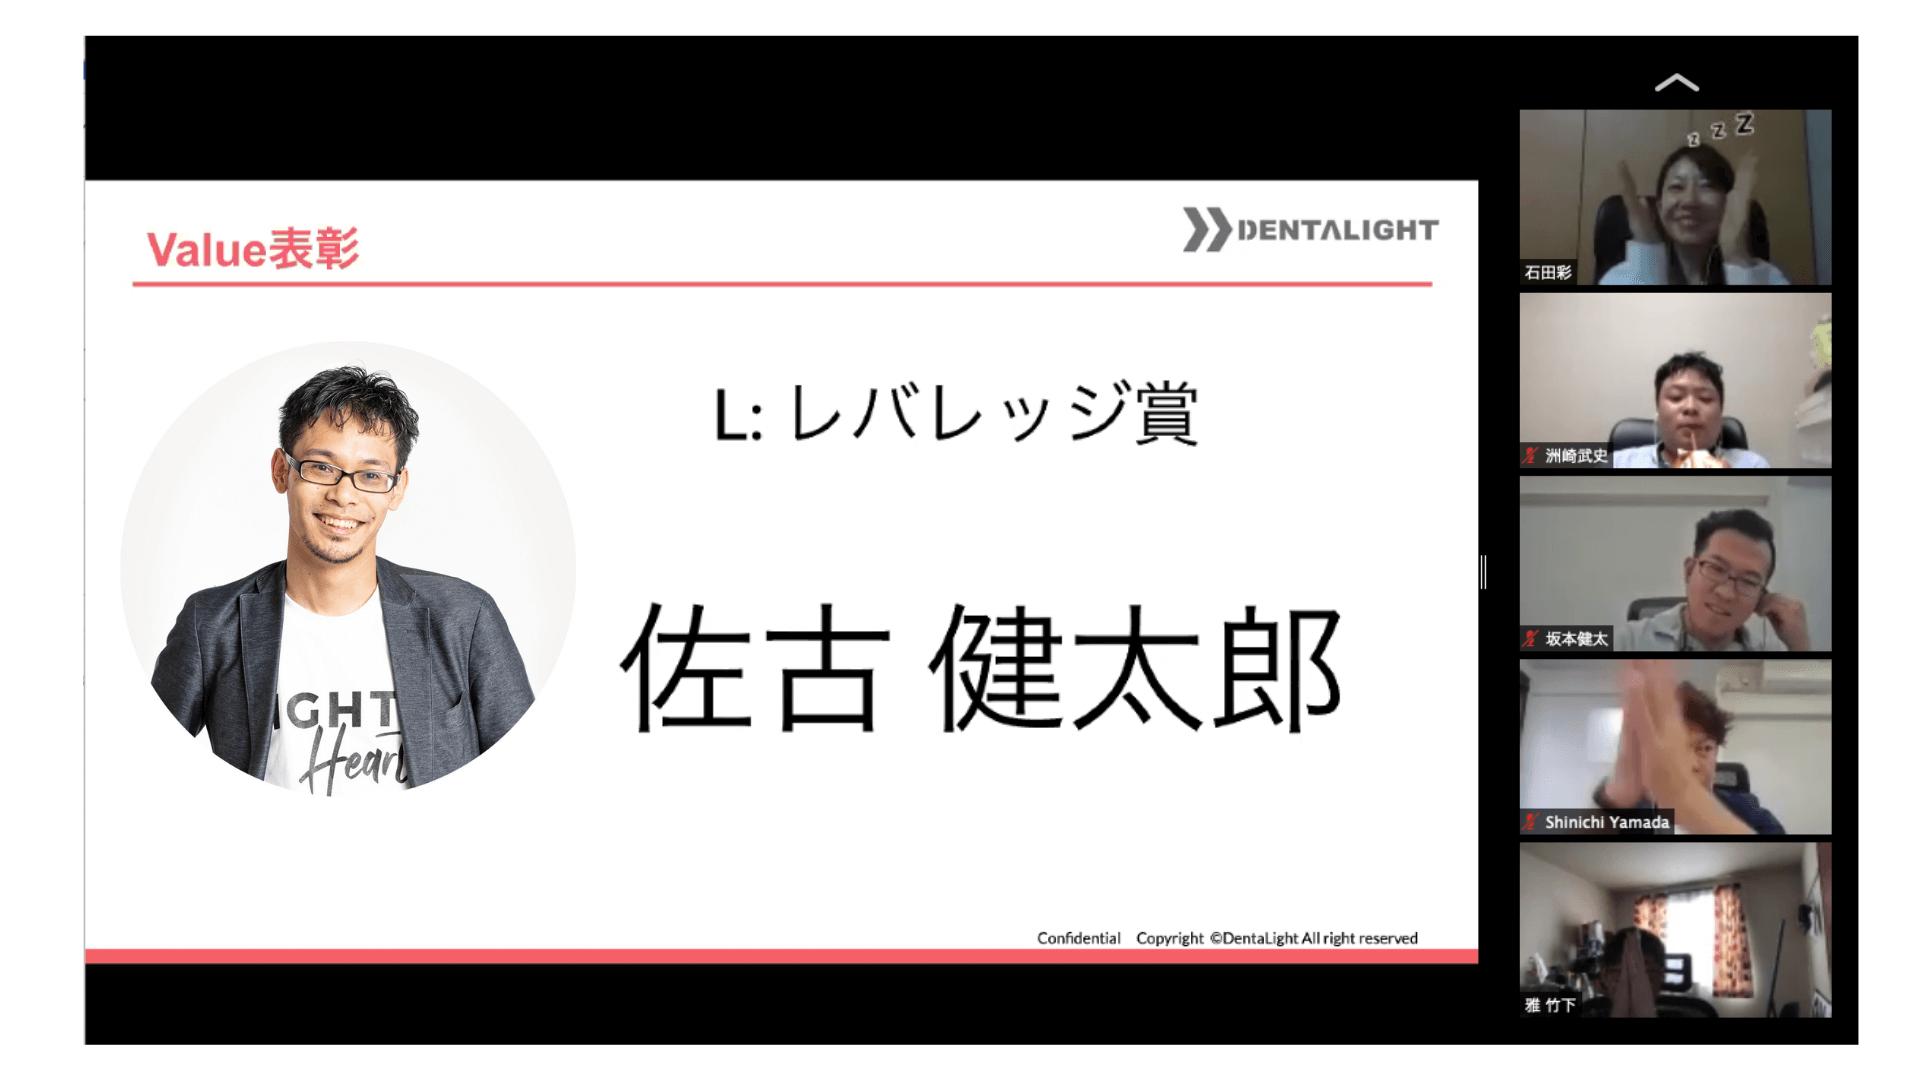 DentaLight デンタライト 社員  佐古 健太郎